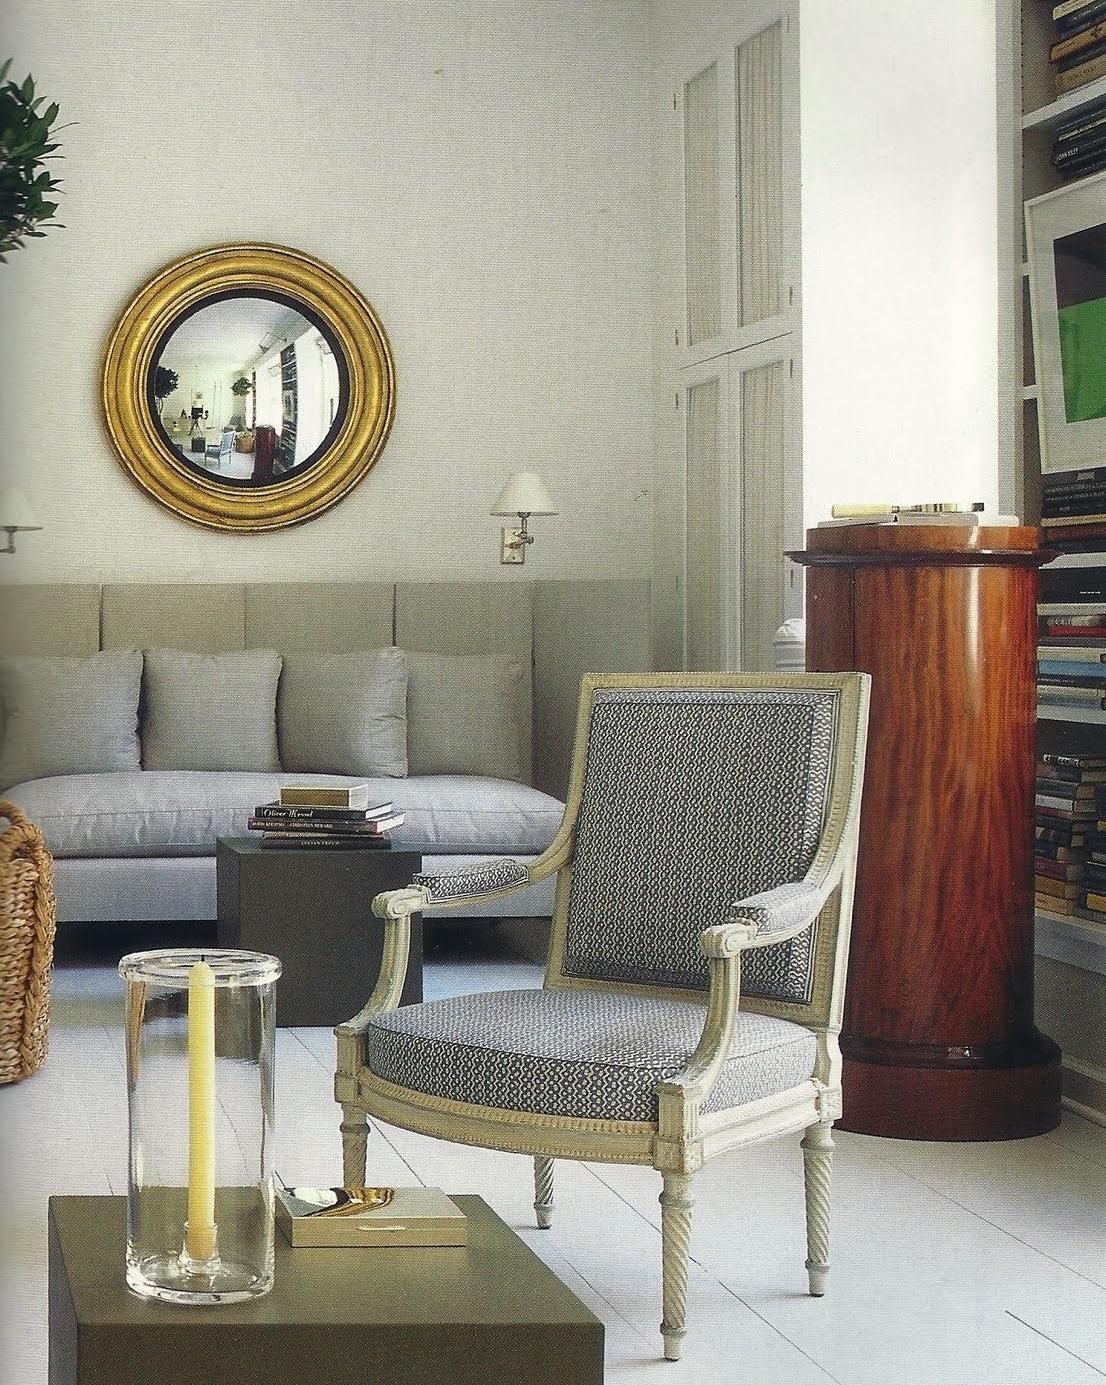 Convex Mirror, Federalist Convex Mirror, Bruce Budd Home Decor With Convex  Mirror Via Belle